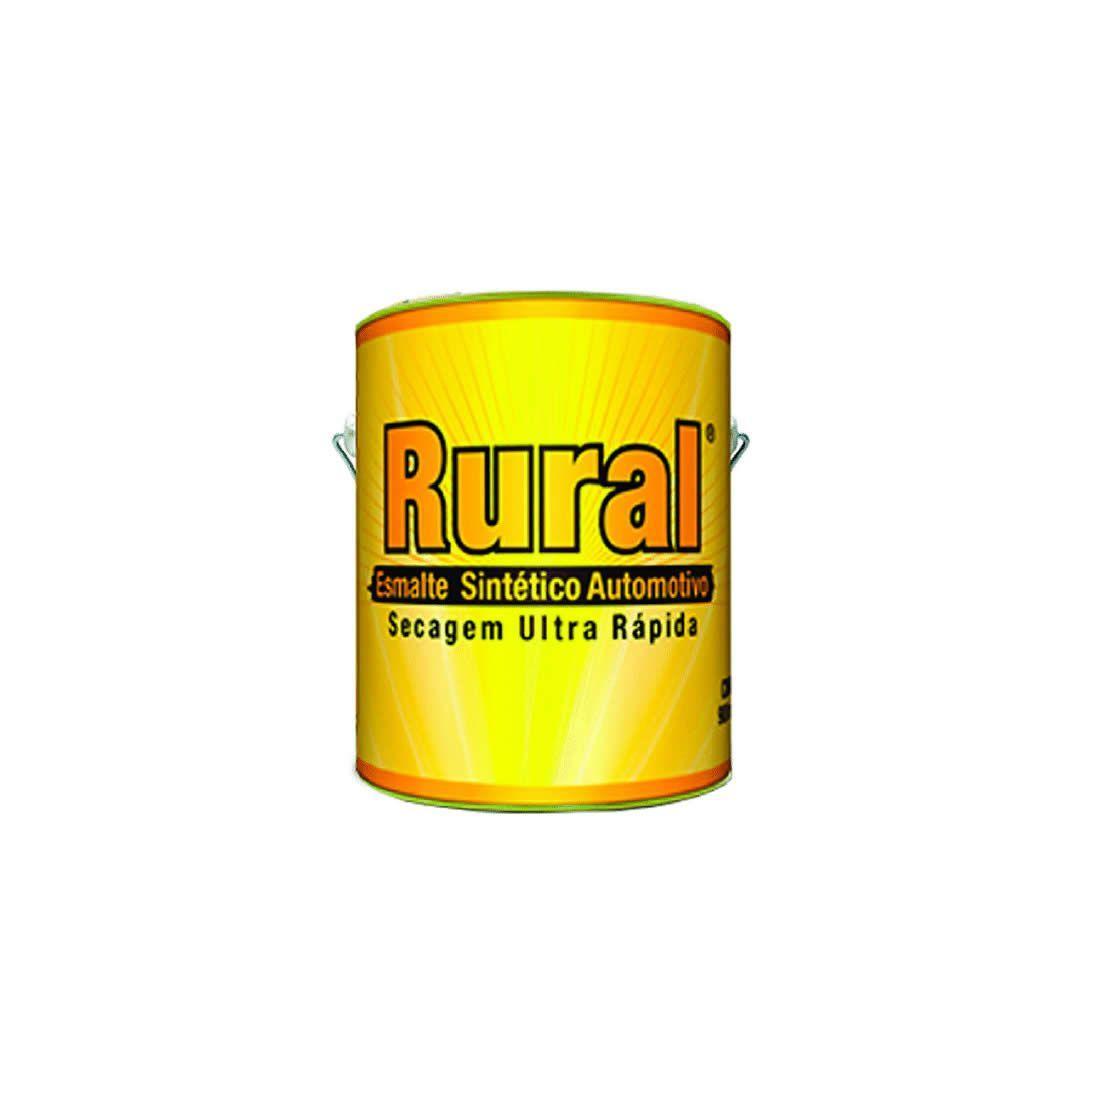 Esmalte Sintético Rural Secagem Ultra Rápido Prata Lunar Metalizado 6218 3,6Lt